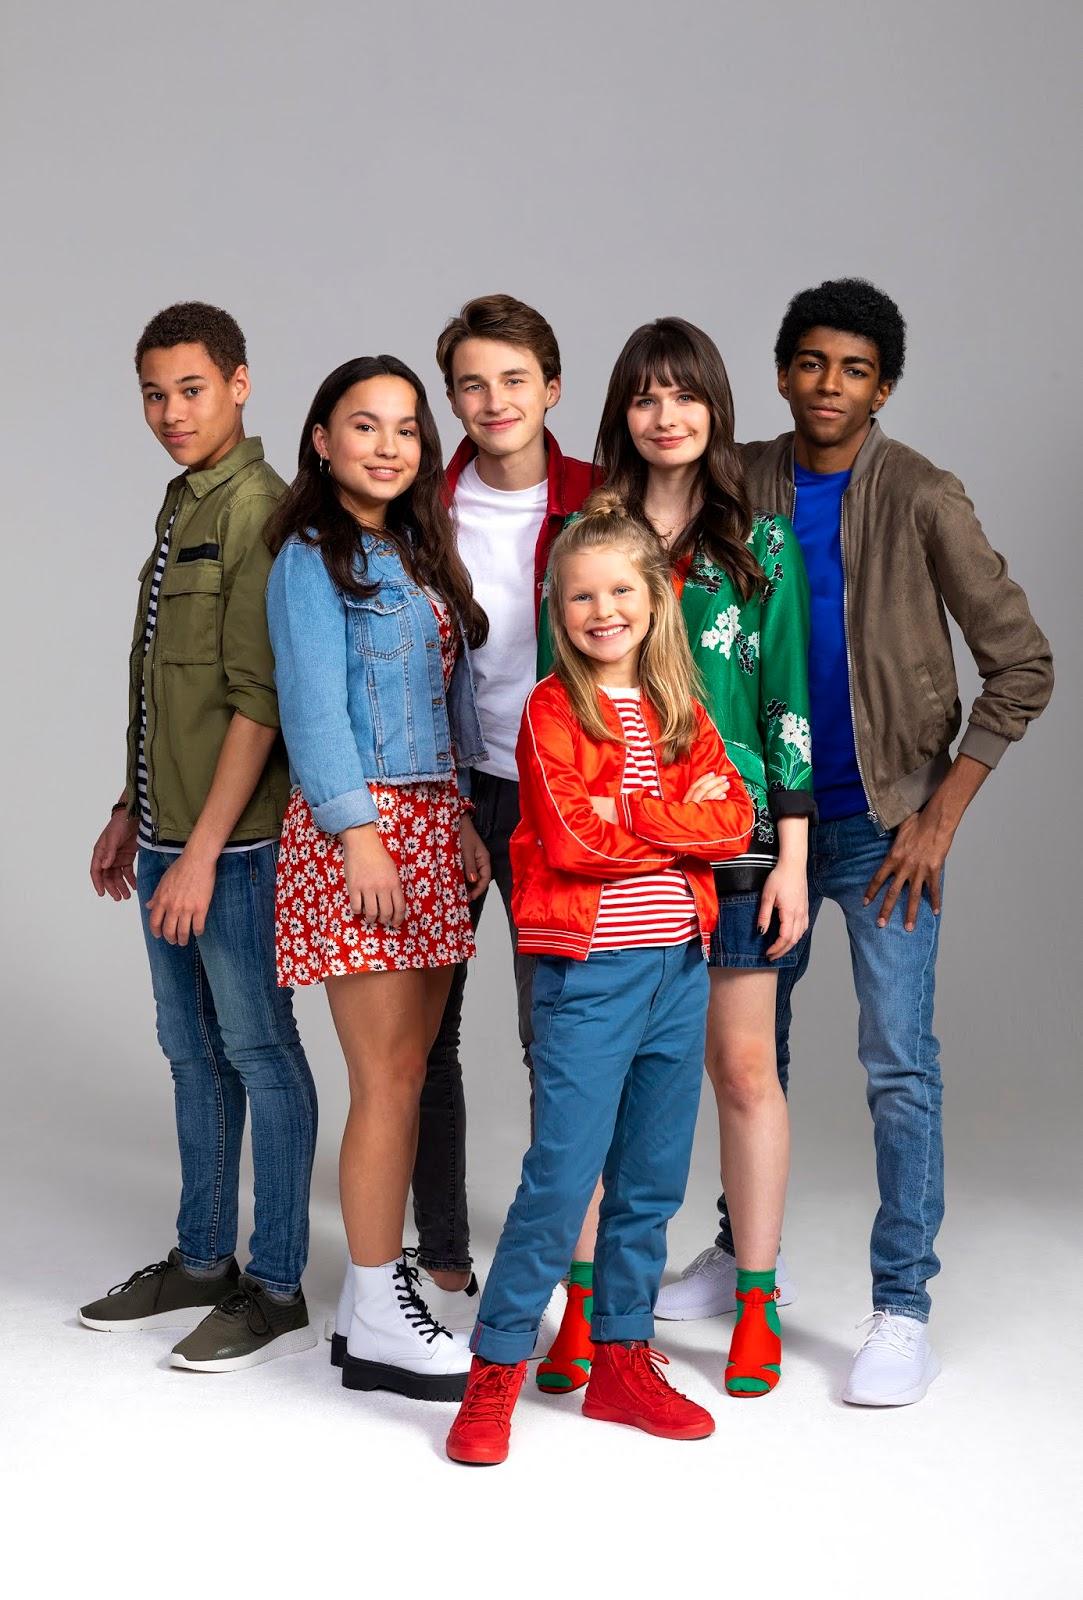 Nickelodeon September 2019 : nickelodeon, september, NickALive!:, Nickelodeon, Australia, Zealand, Premiere, 'Hunter, Street', Season, Monday, September